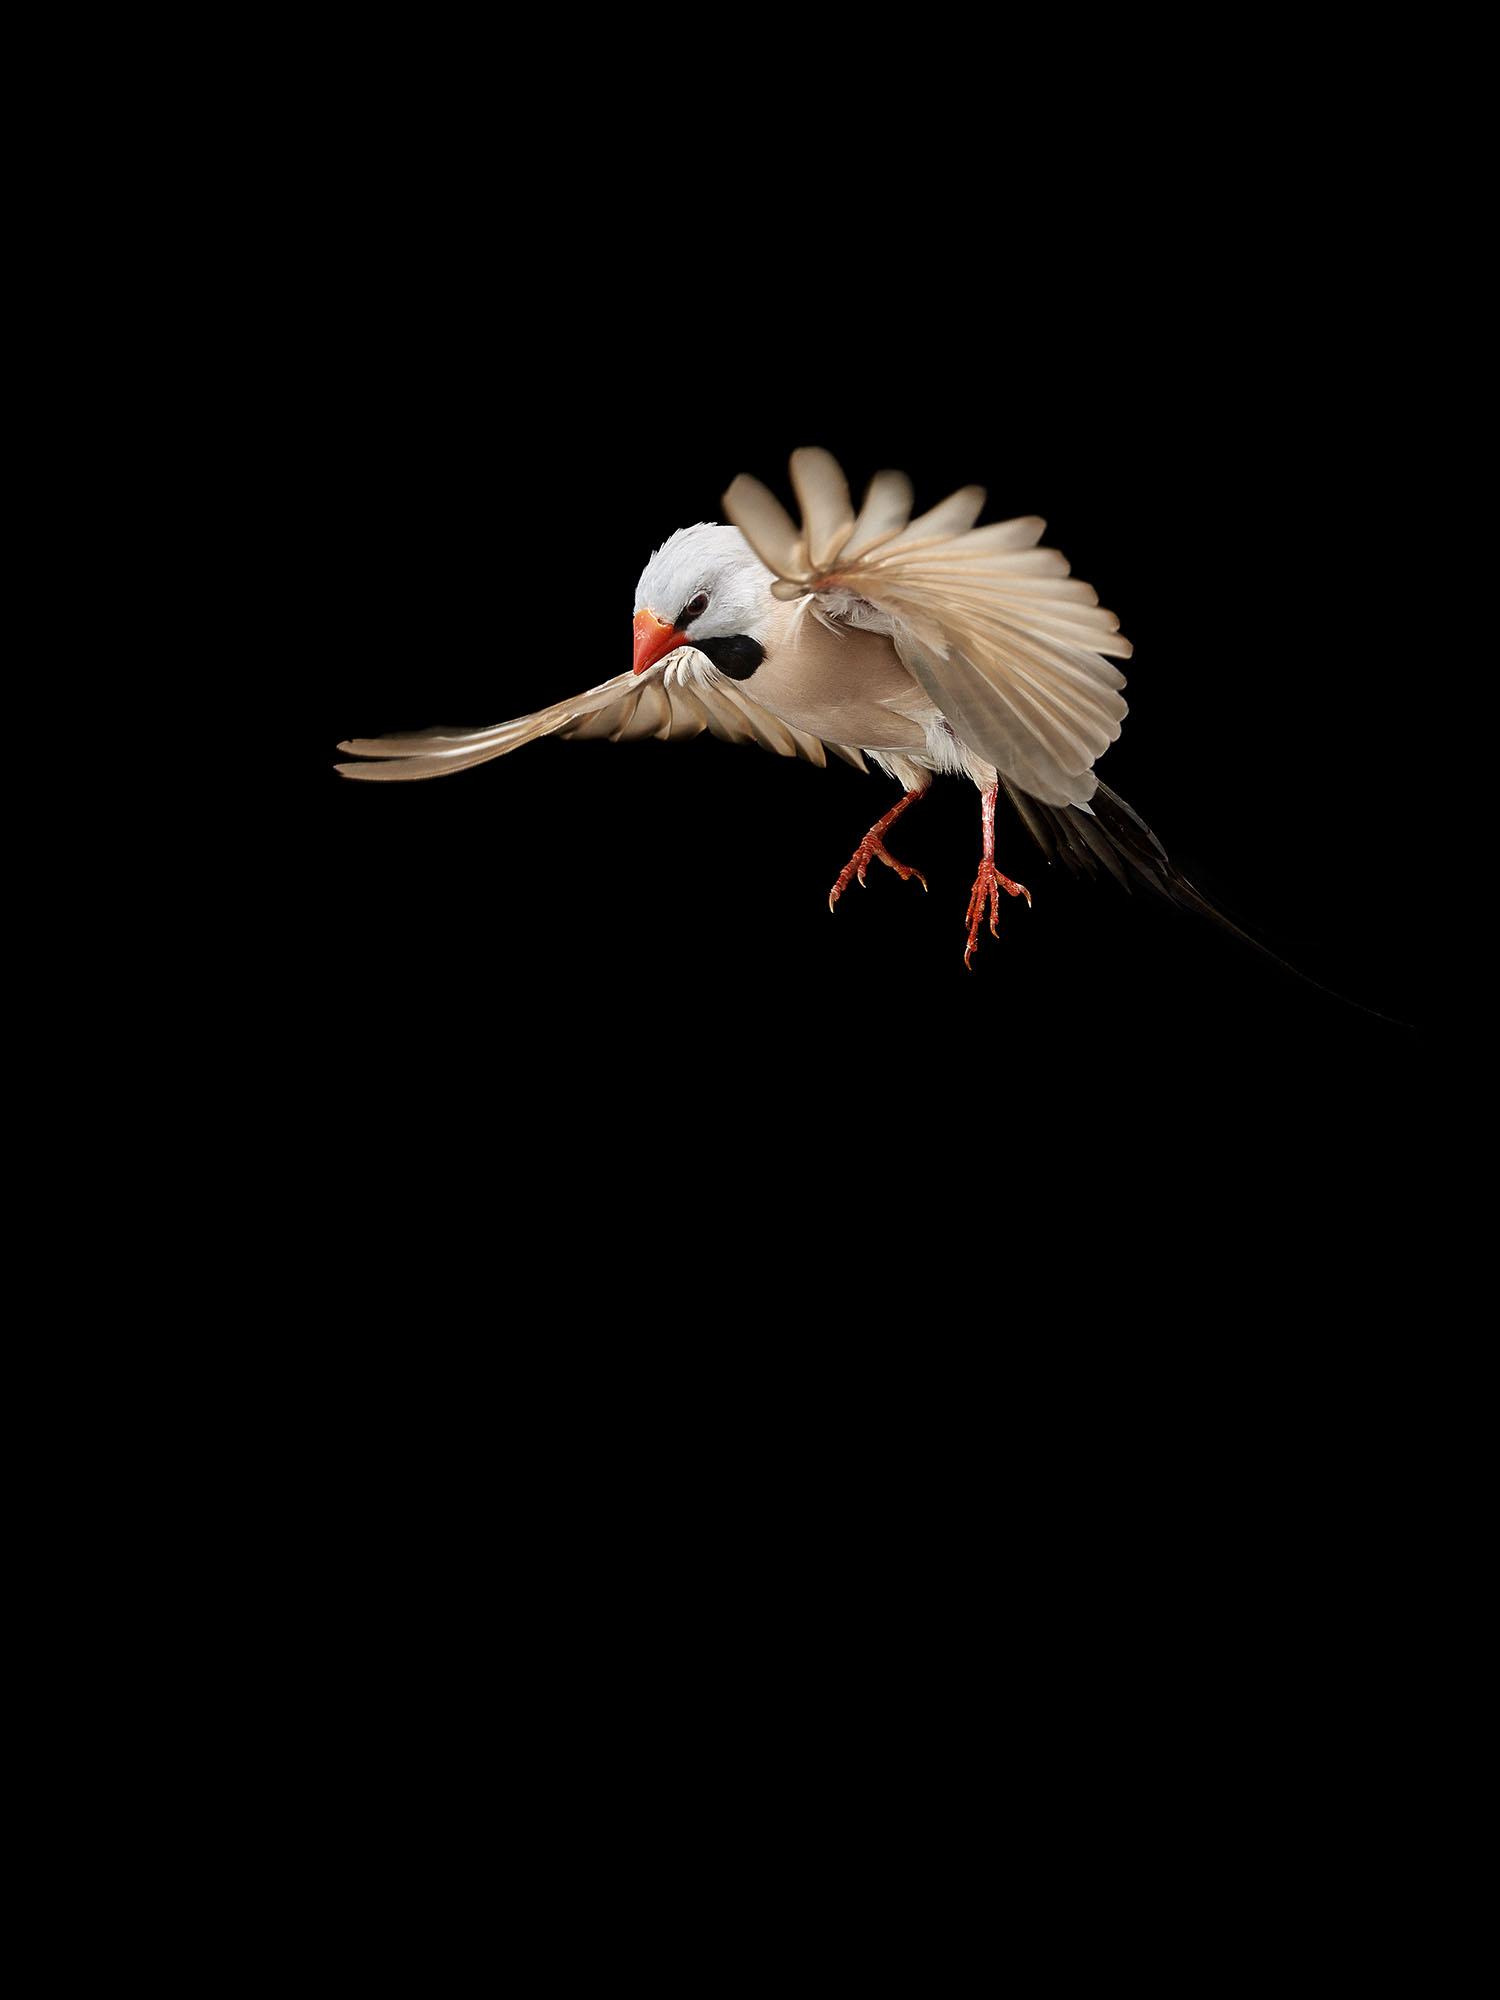 long-tailed-finch-gary-heery-bird-print